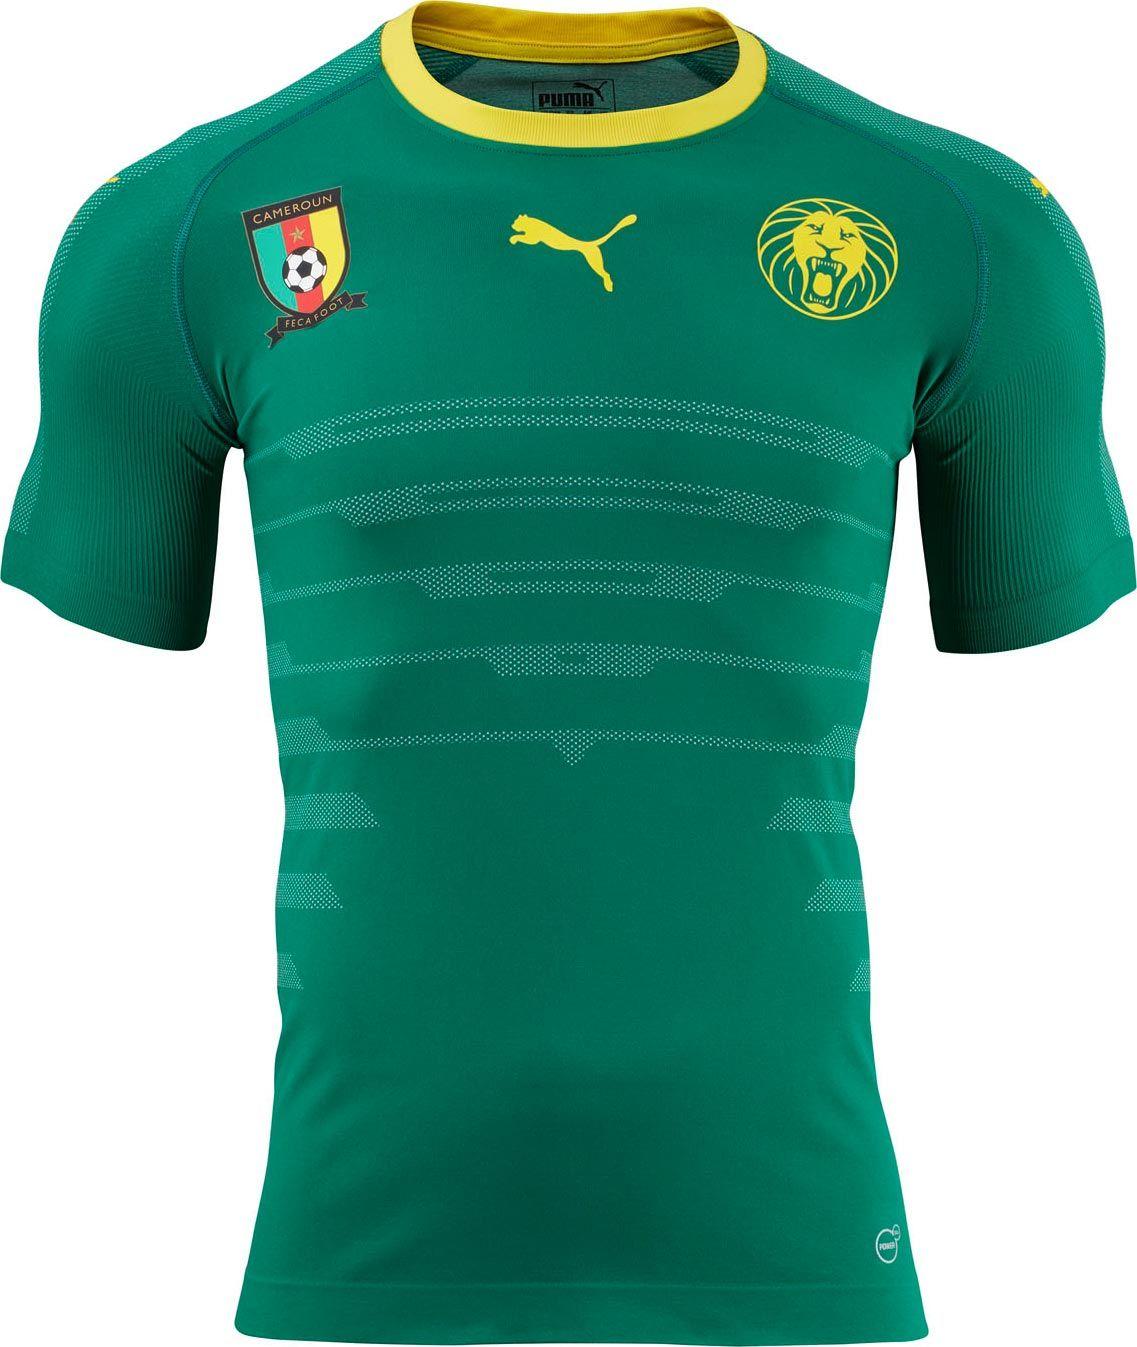 Cameroon (Fédération Camerounaise de Football) - 2016/2017 Puma Home Shirt